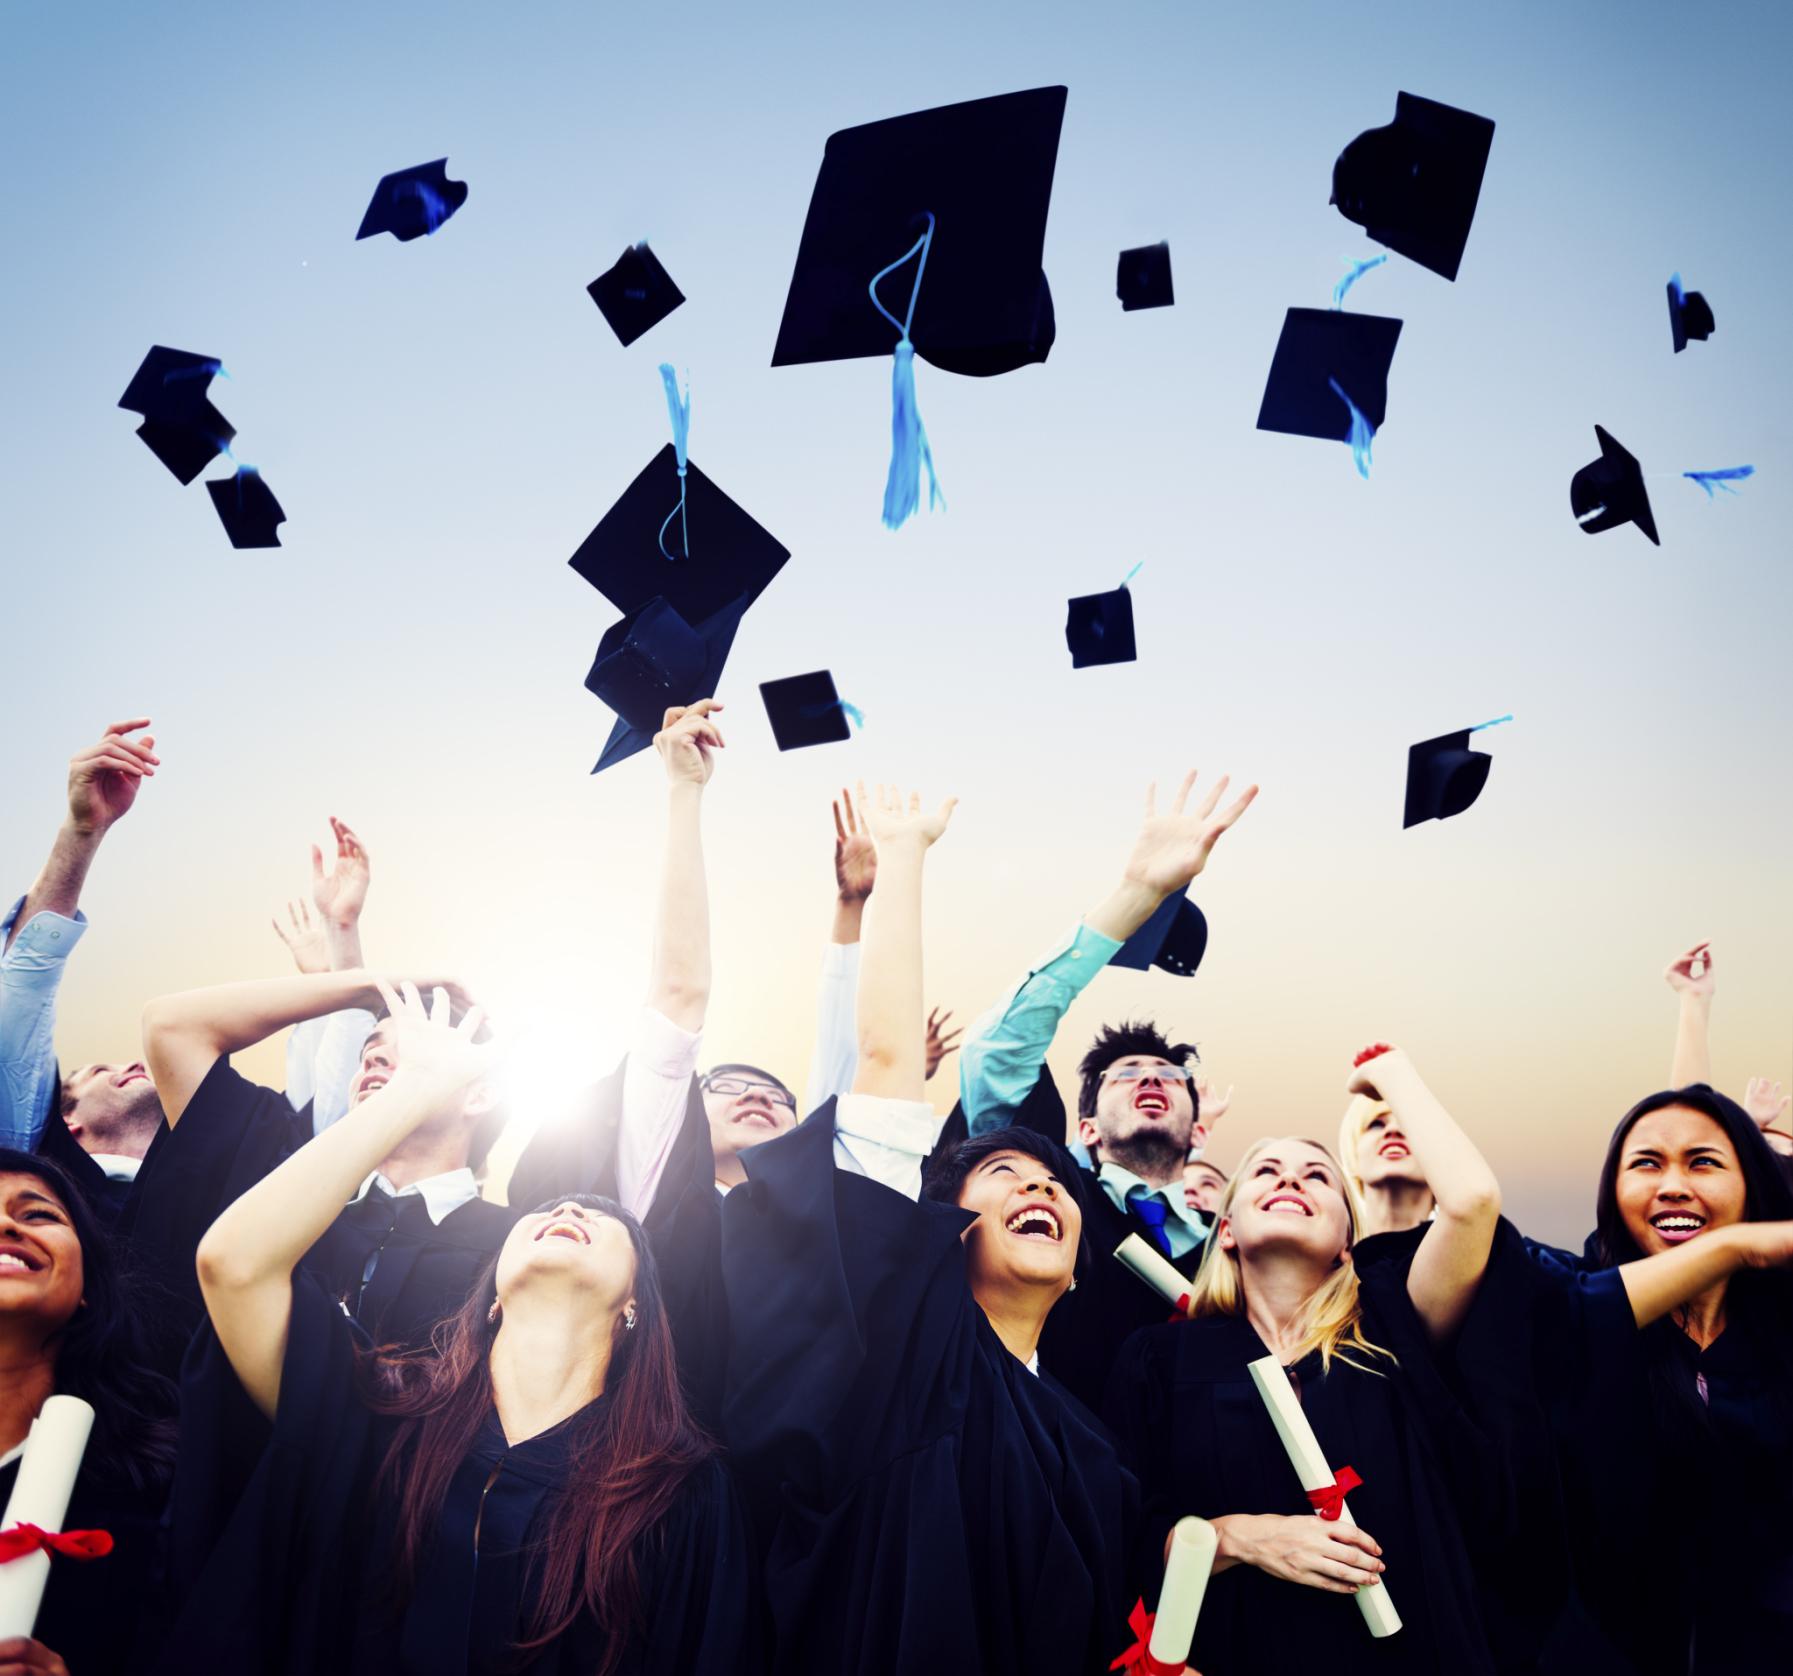 Where to celebrate graduation 38